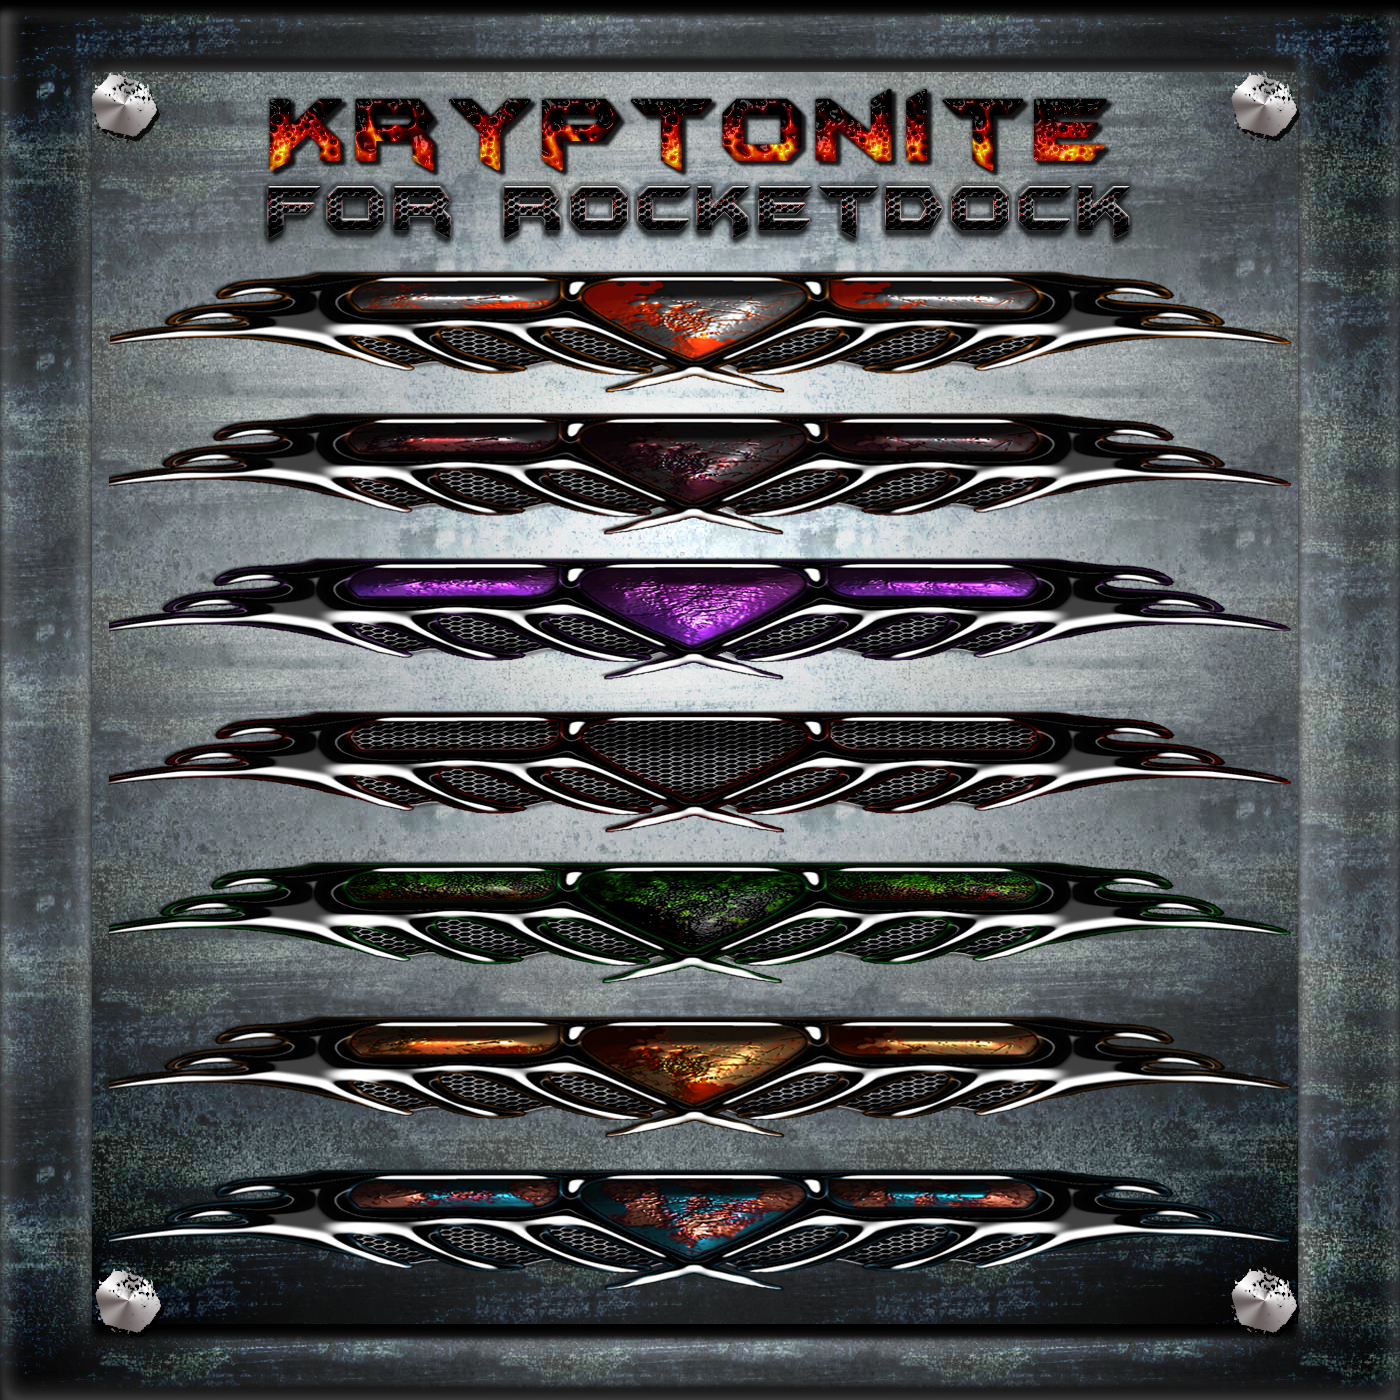 Kryptonite for Rocketdock by ionstorm01